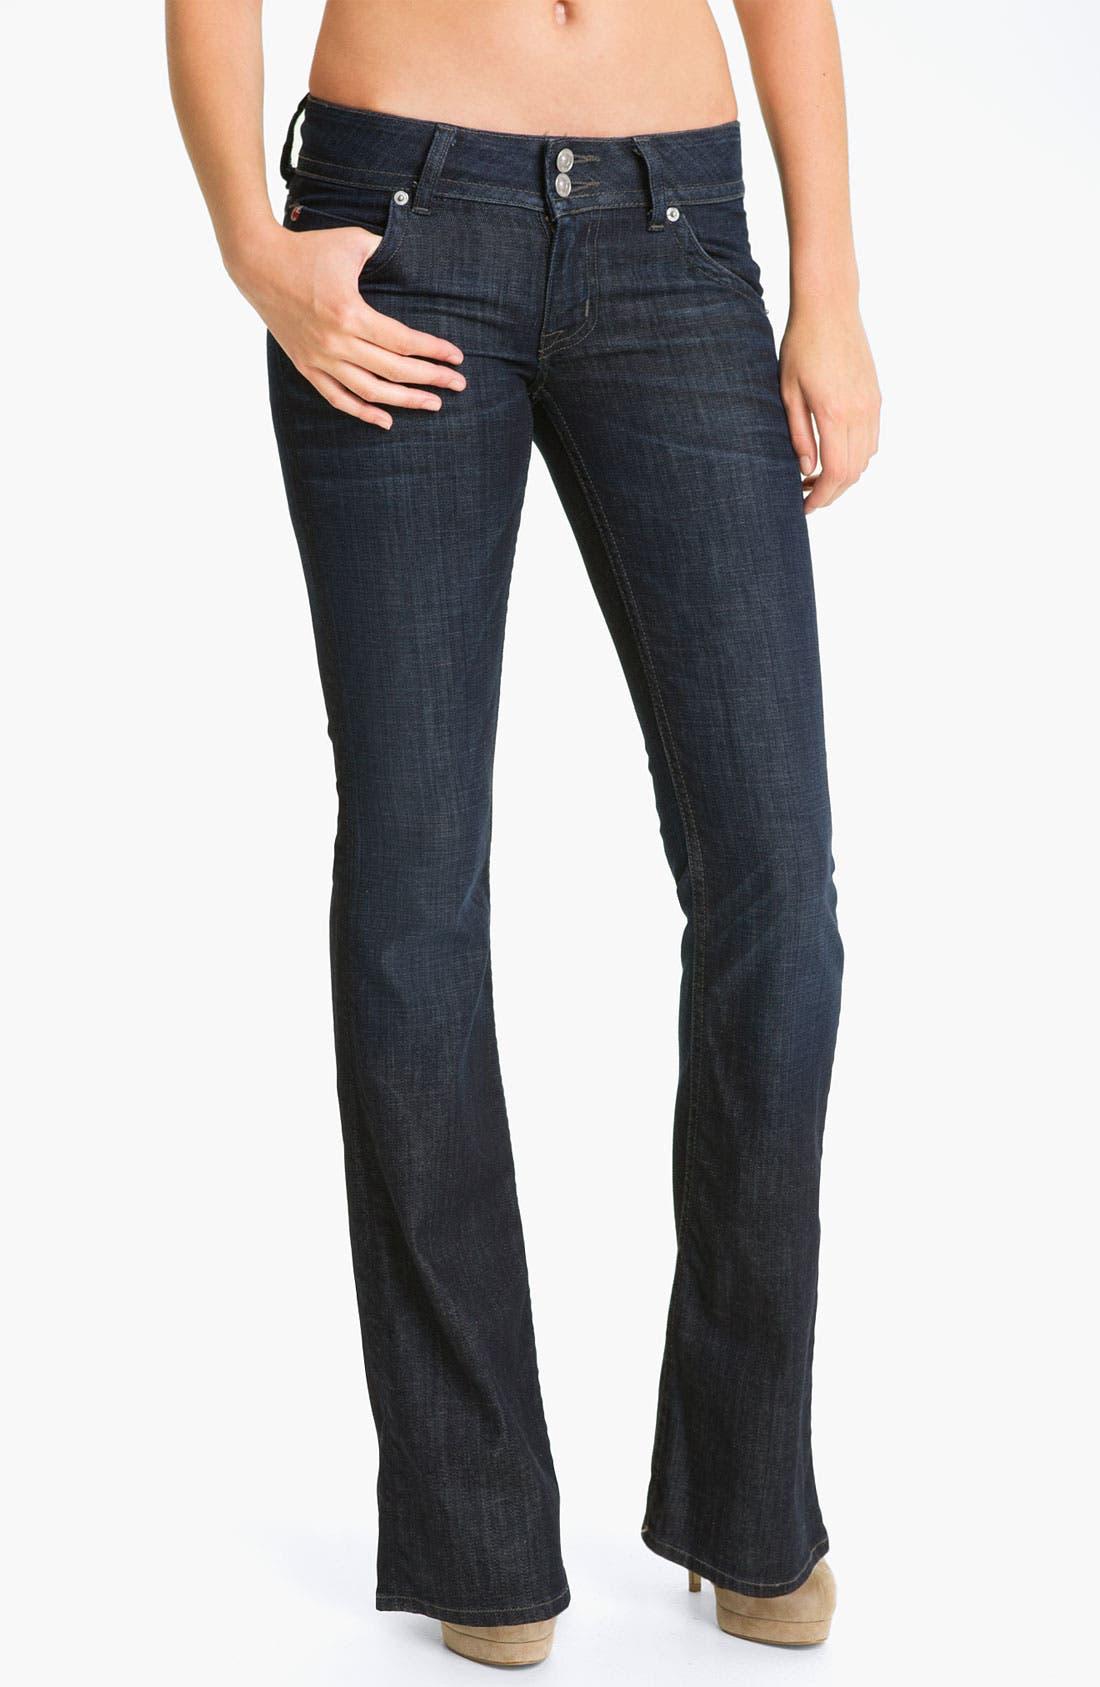 Alternate Image 1 Selected - Hudson Jeans Signature Flap Pocket Bootcut Jeans (Savage)